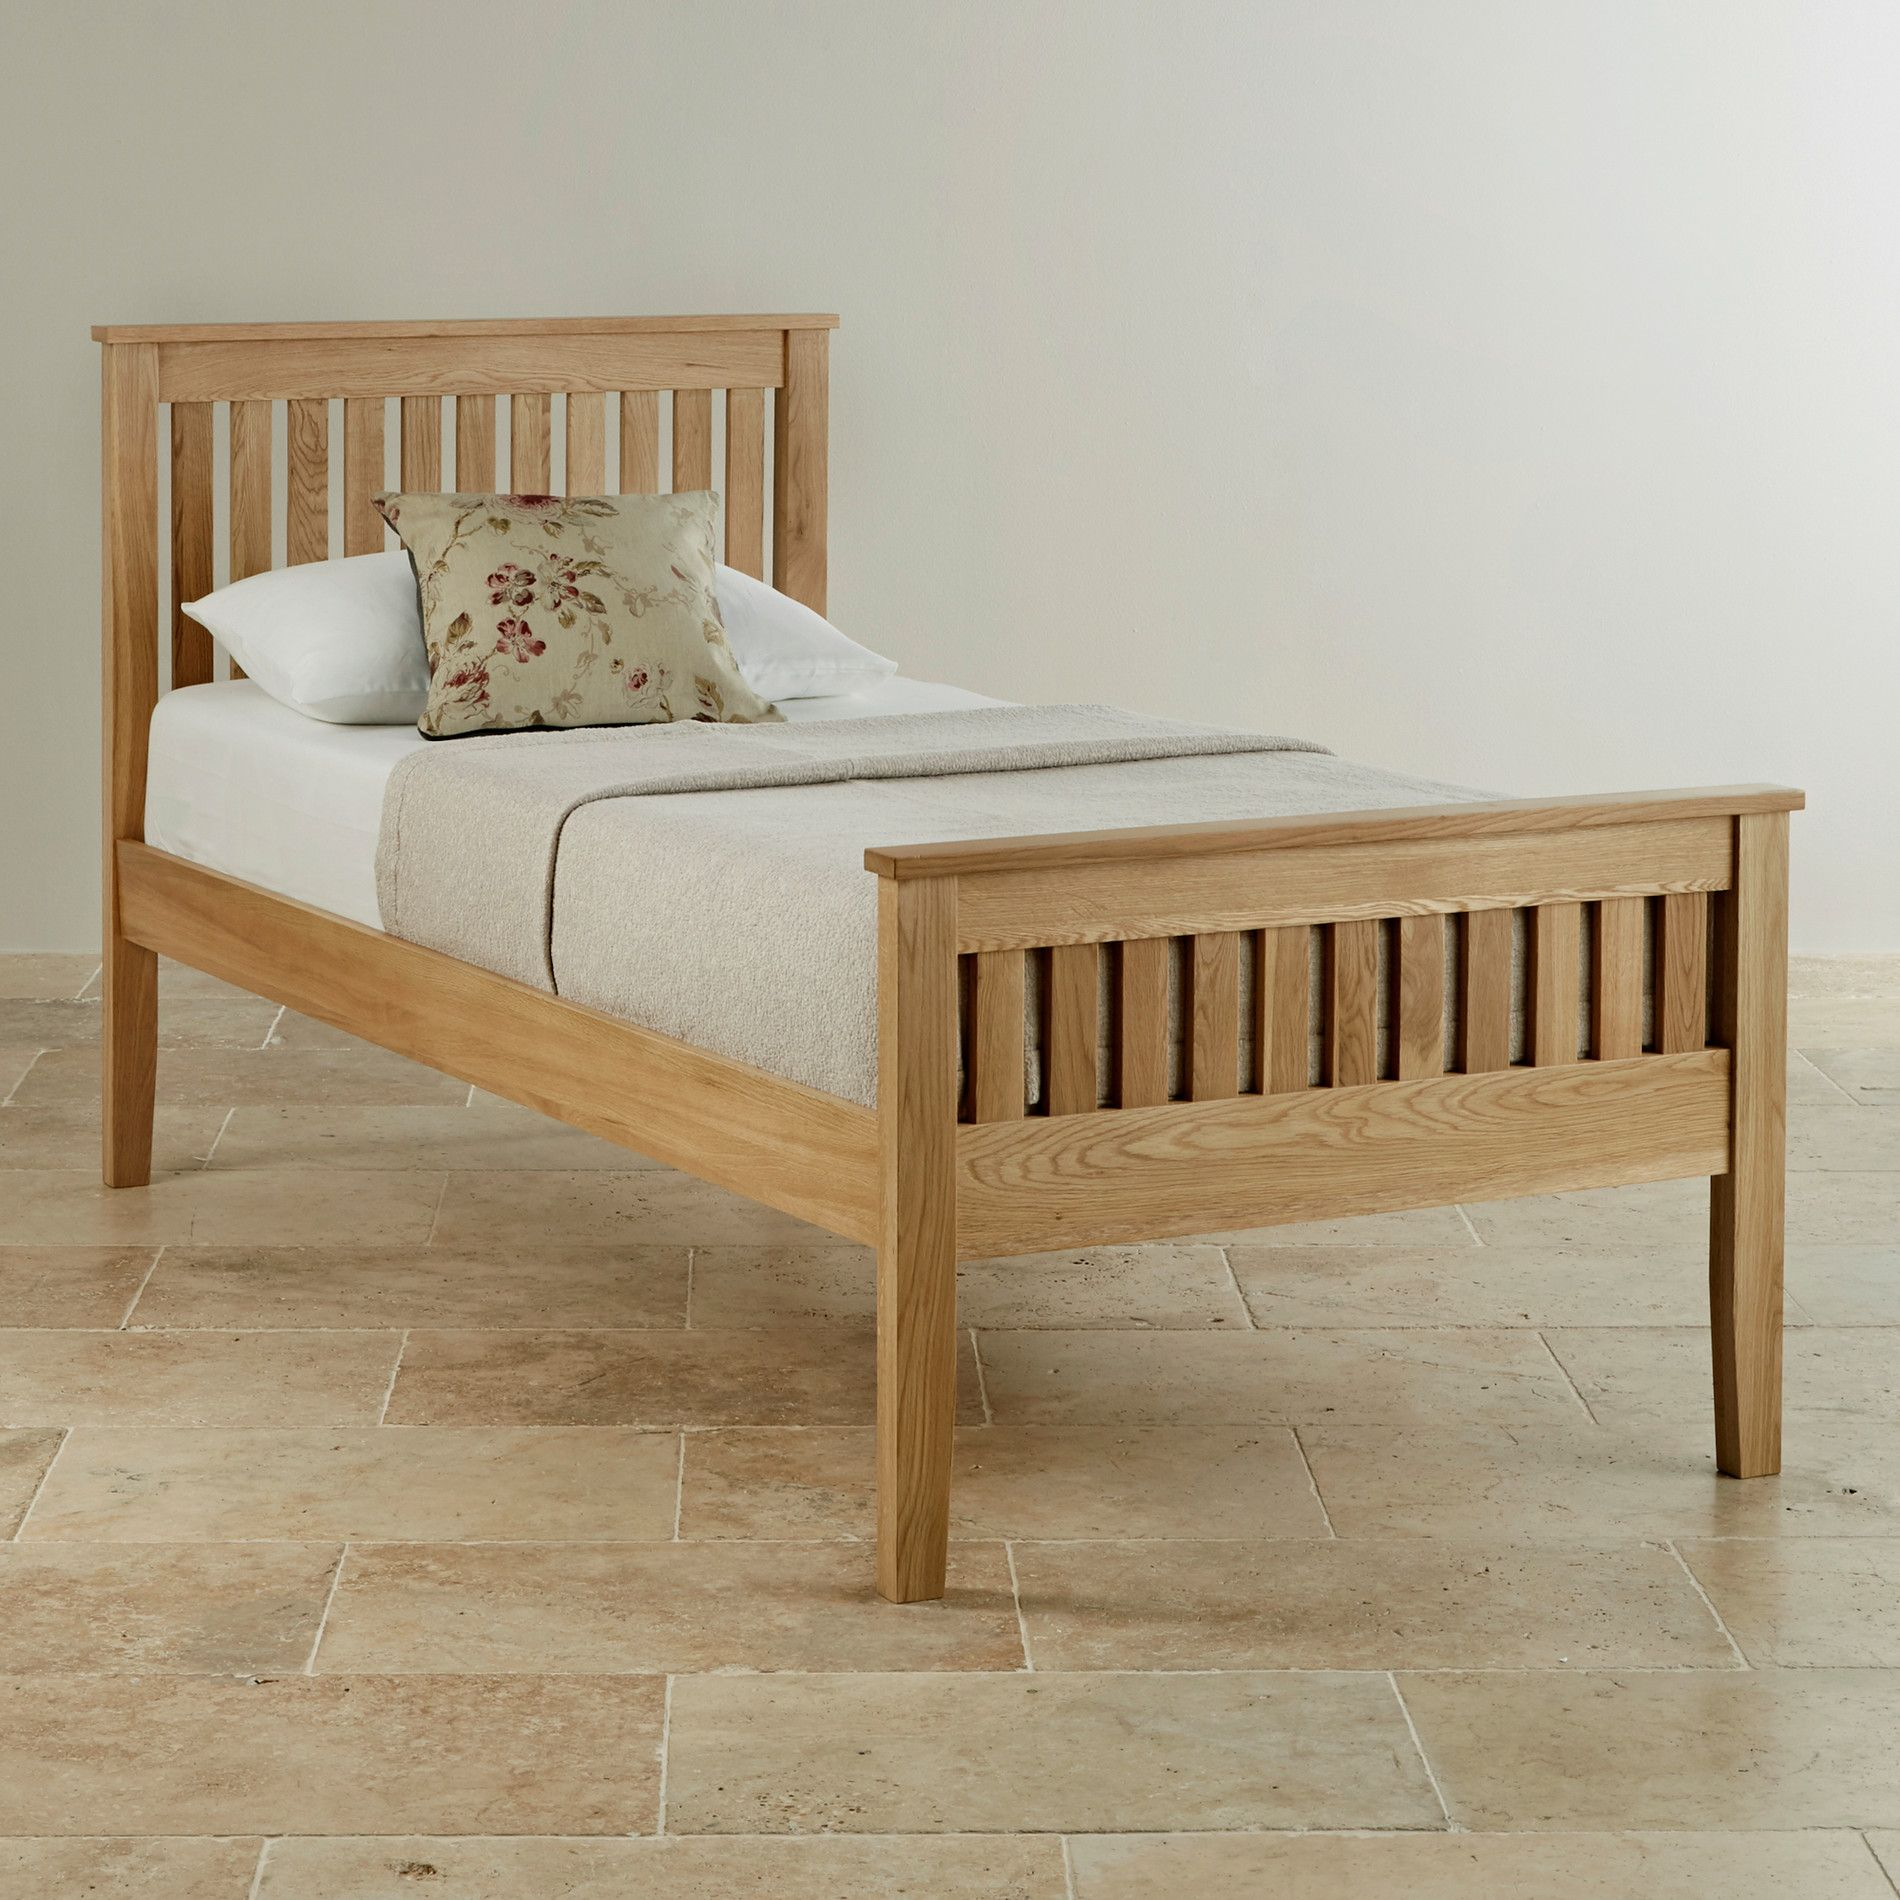 Cairo Oak Single Bed From The Cairo Solid Oak Range By Oak Furniture Land Bed Single Bed Solid Oak Beds